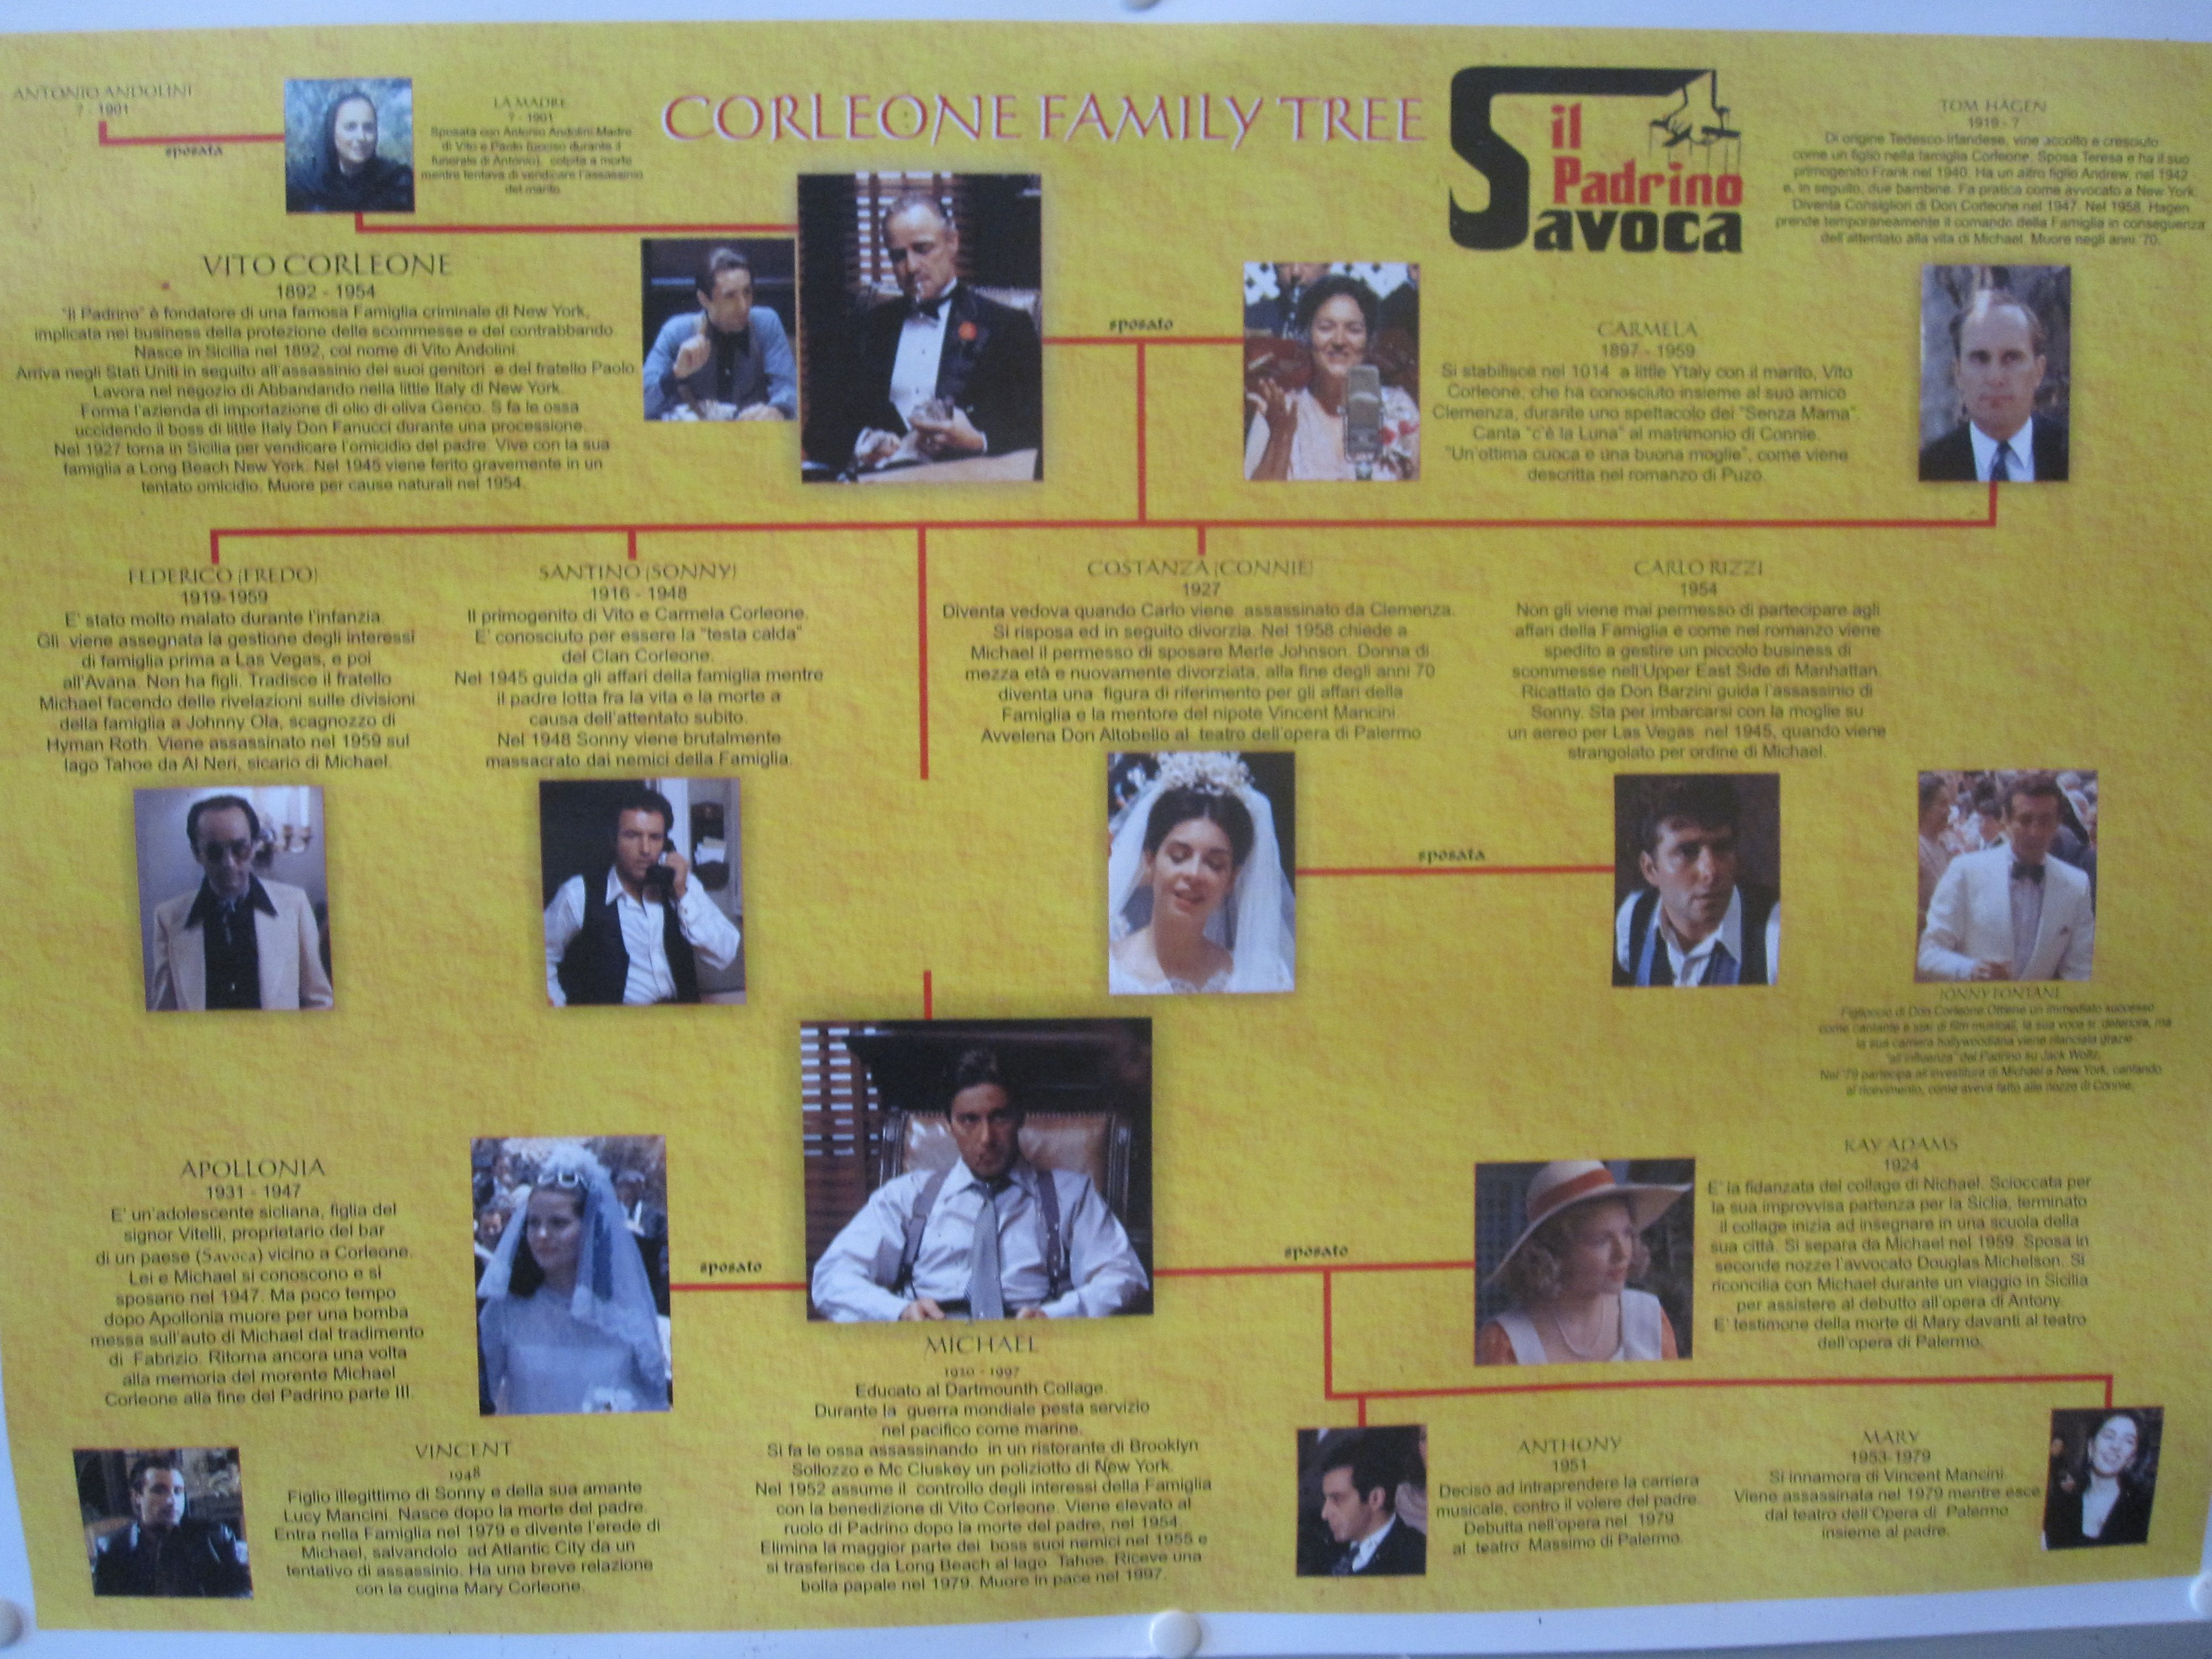 Corleone family - Alejandro Roig and Rafael Lerga ...  |Corleone Crime Family Tree